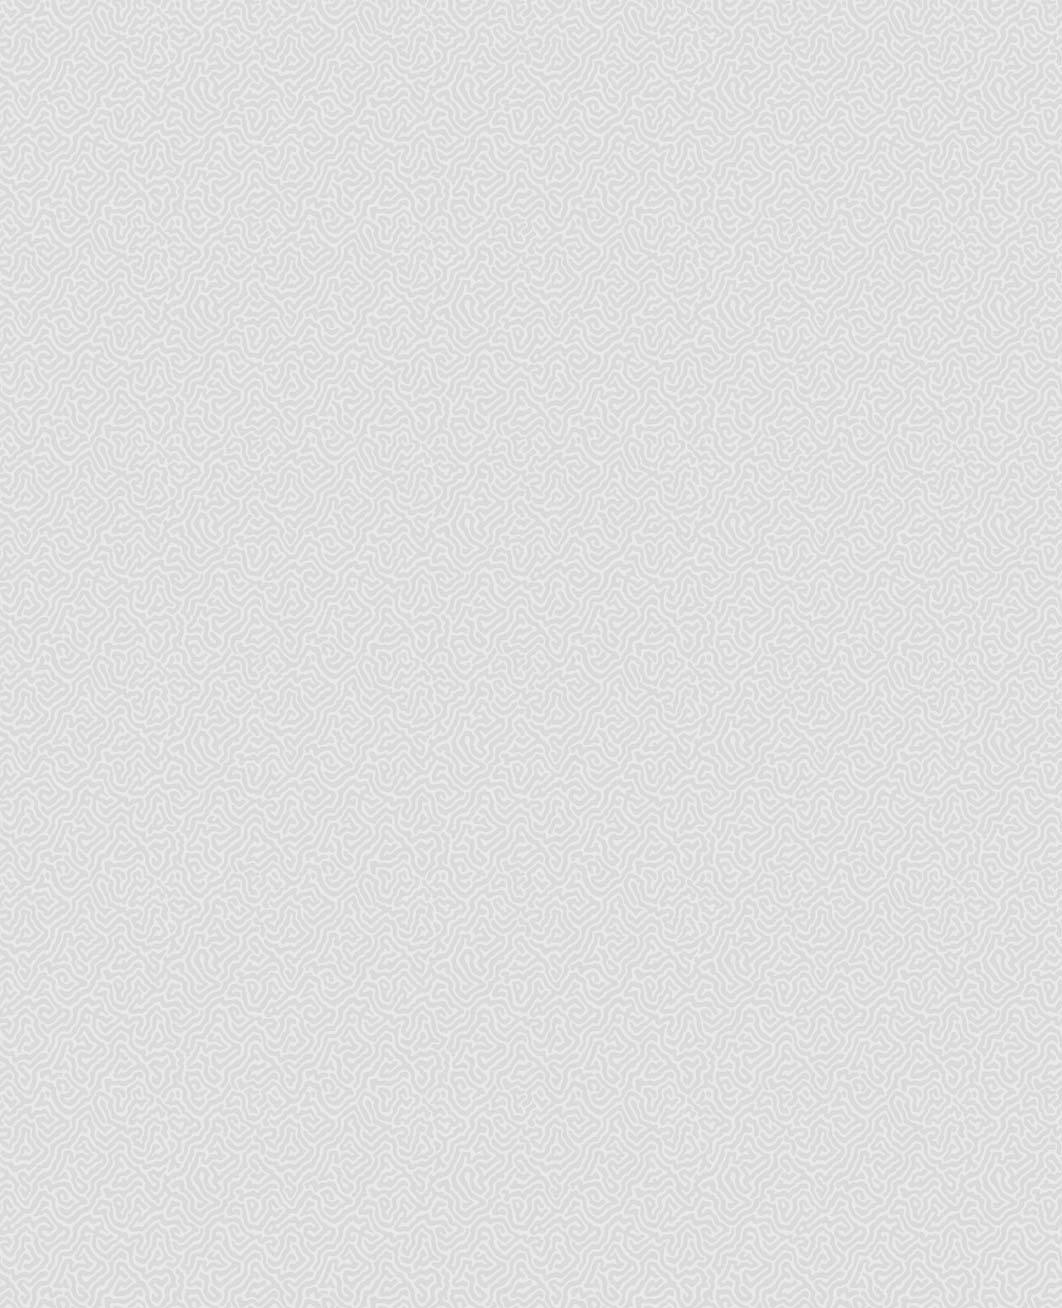 Обои Cole & Son Landscape Plains 106/5061, интернет магазин Волео